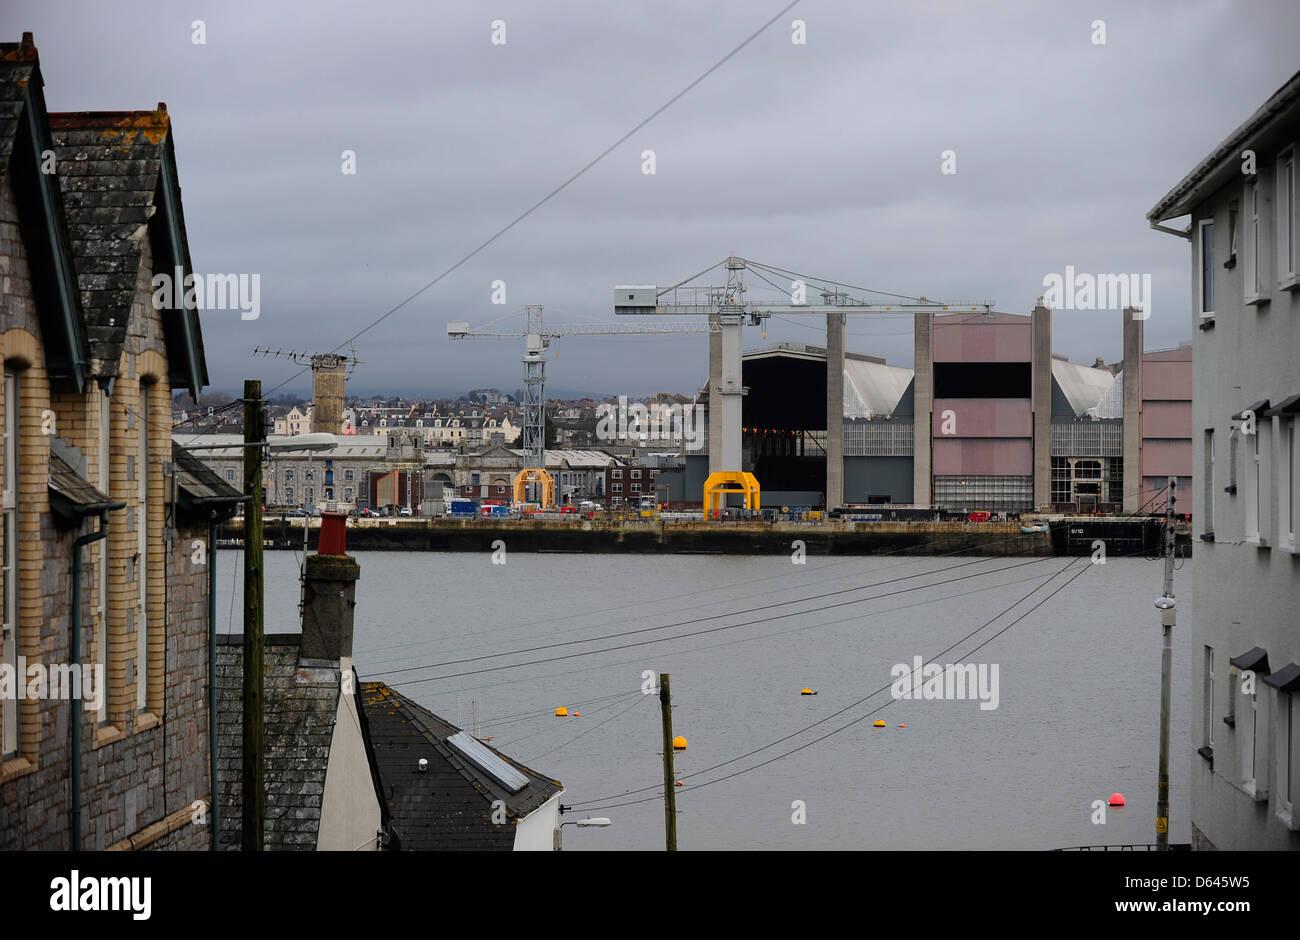 HM Dockyard Devonport, Plymouth, Devon, an MOD site, seen from across the estuary Stock Photo